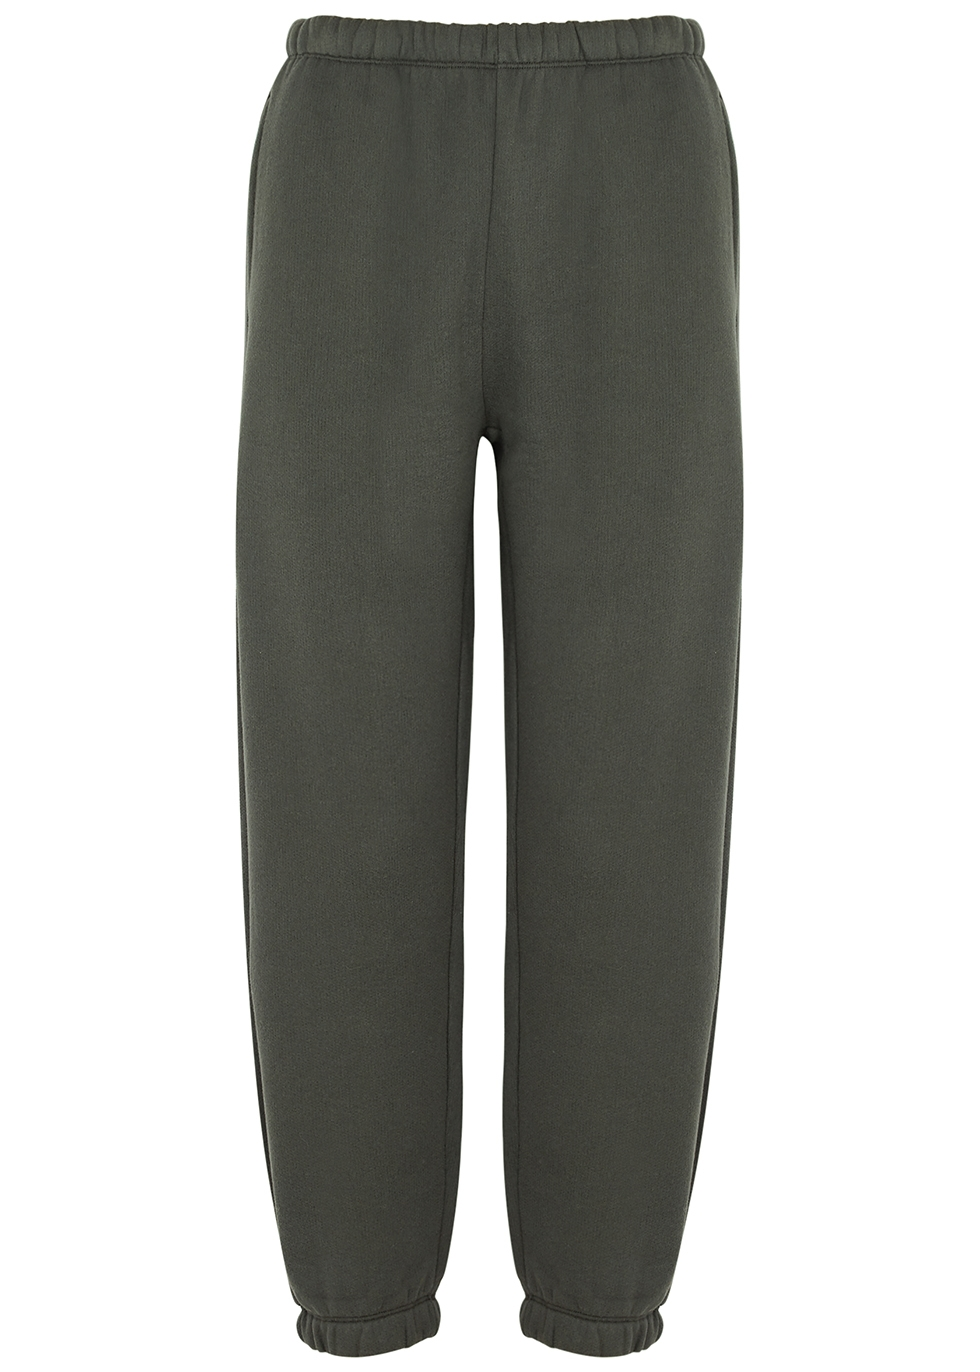 Ikatown grey cotton-blend sweatpants